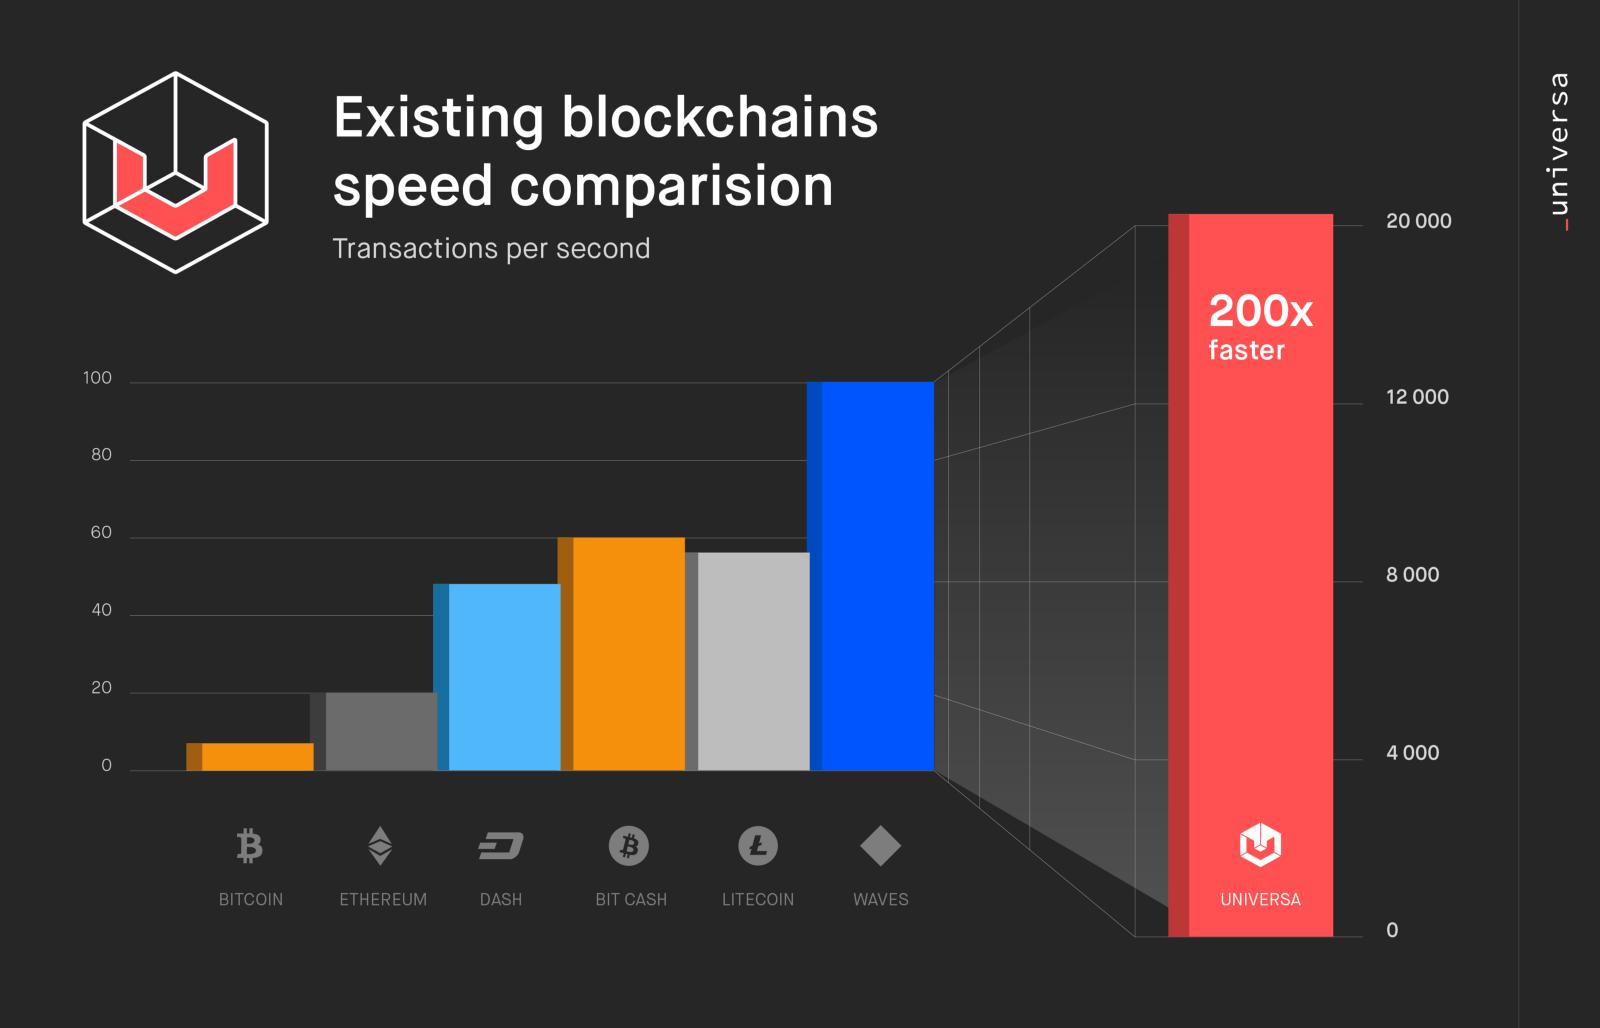 universa blockchain.jpeg